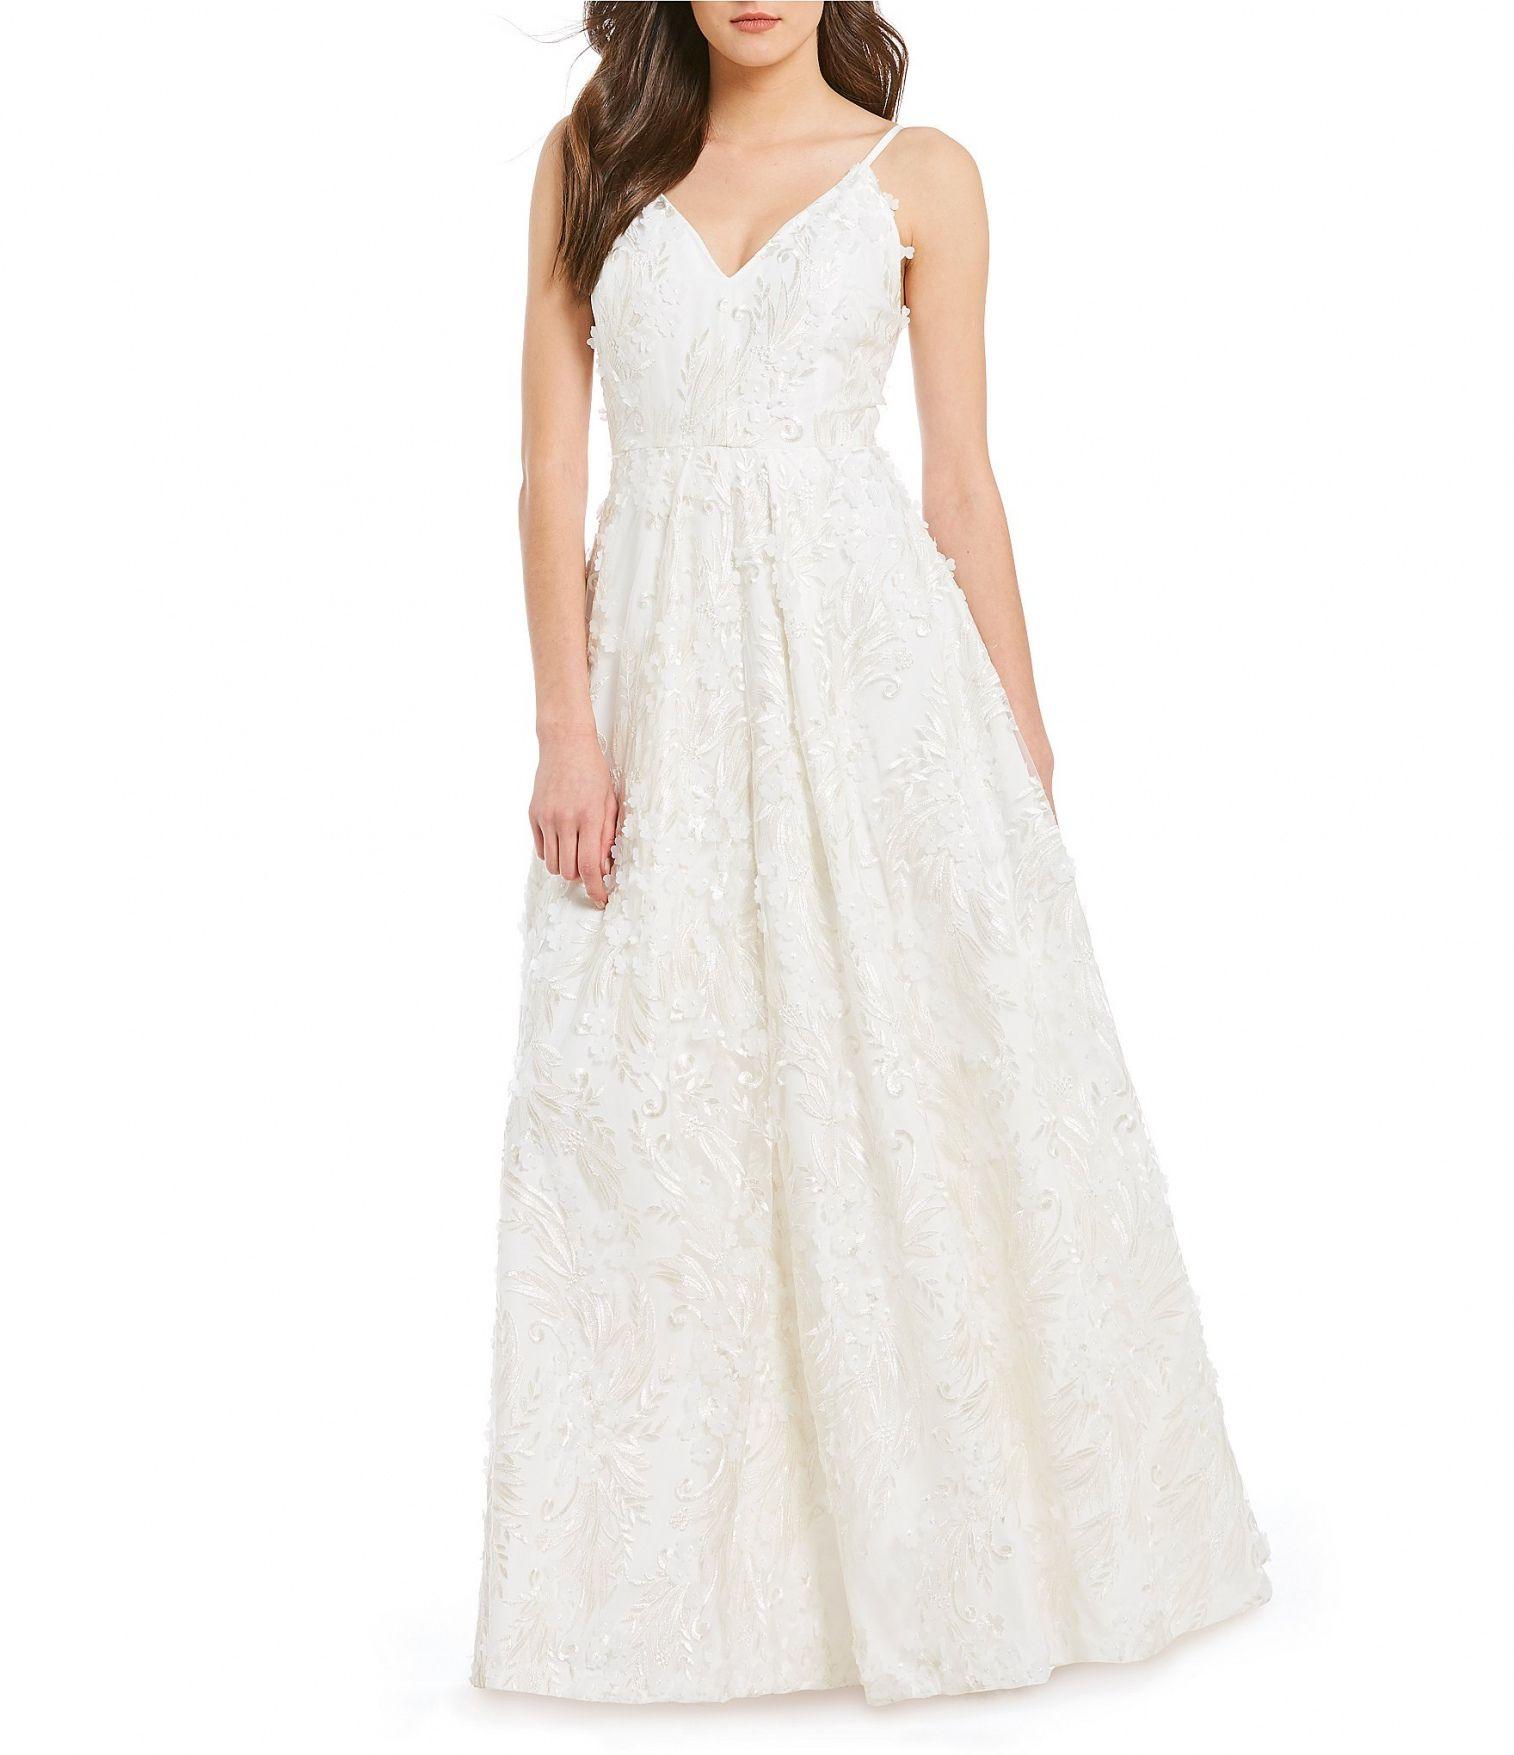 Wedding dresses dillards   Wedding Dresses at Dillards  Dressy Dresses for Weddings Check